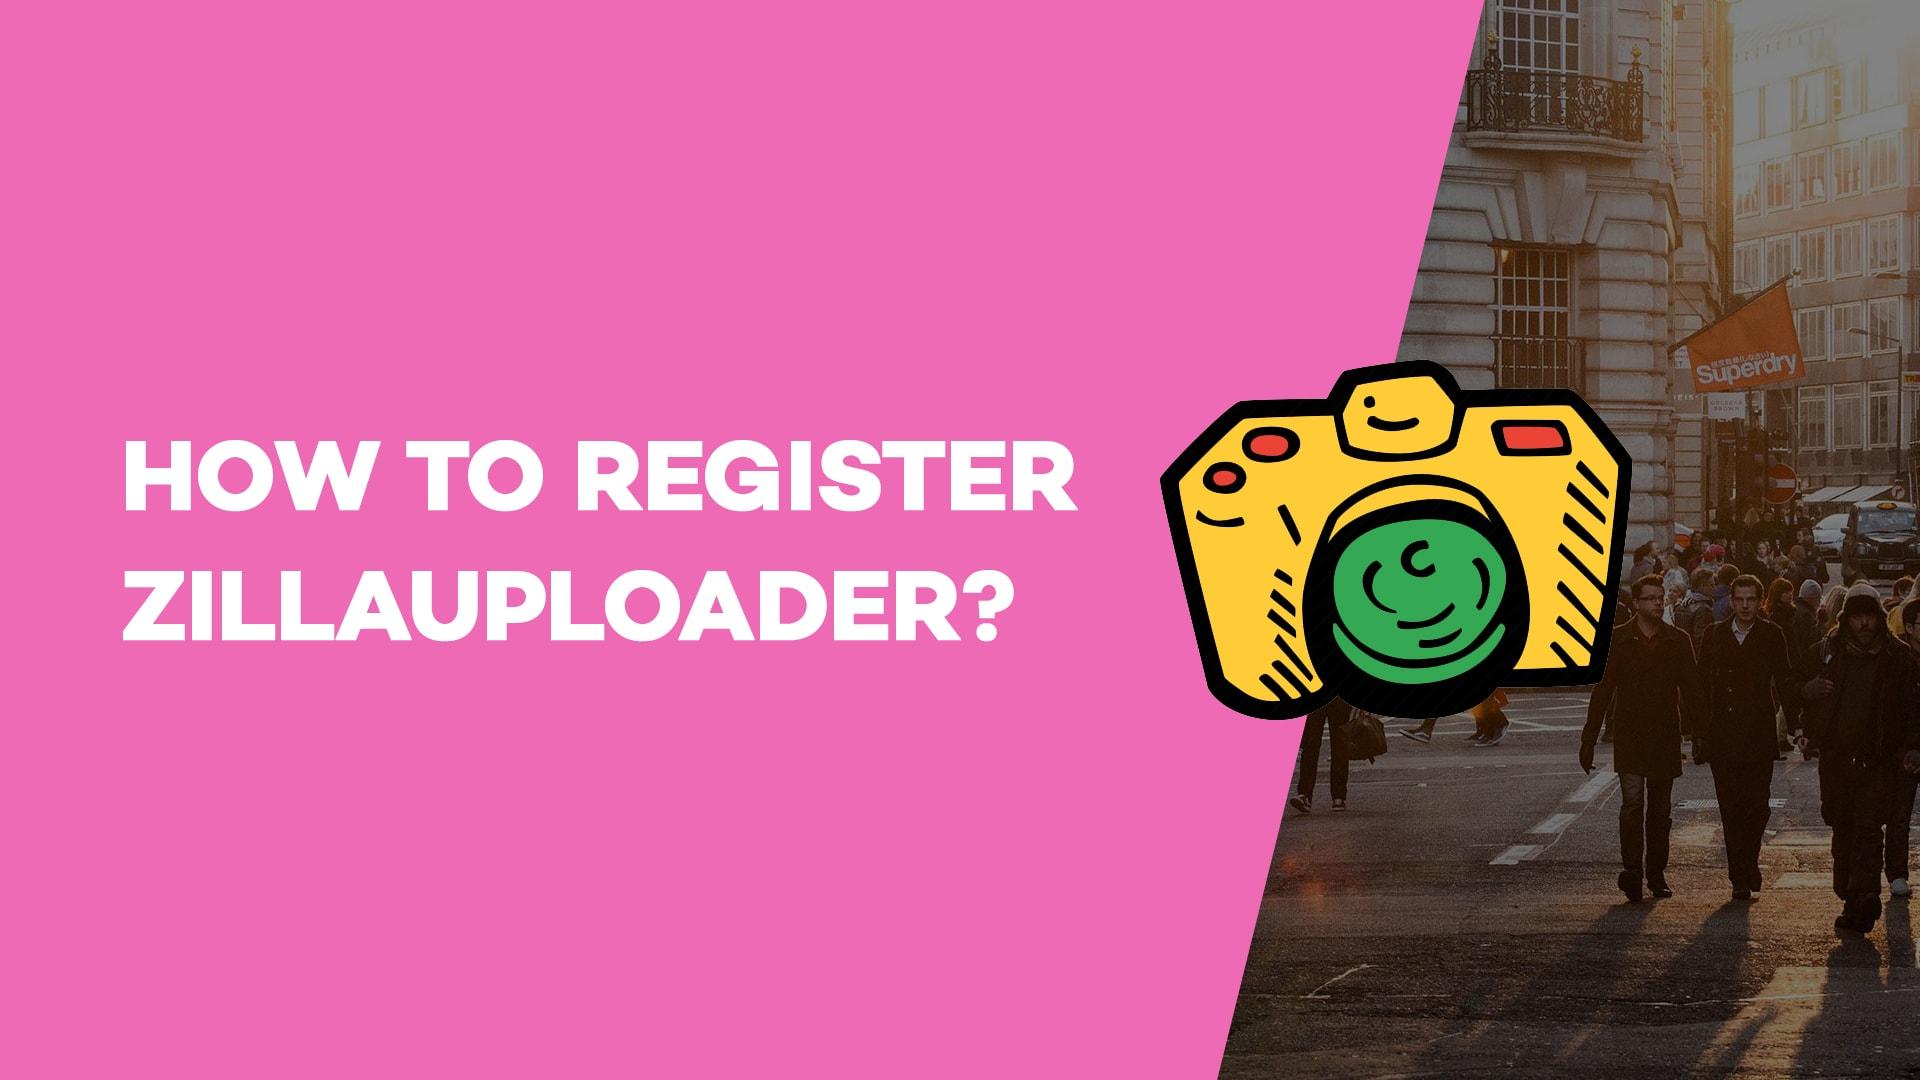 How to register Zillauploader?